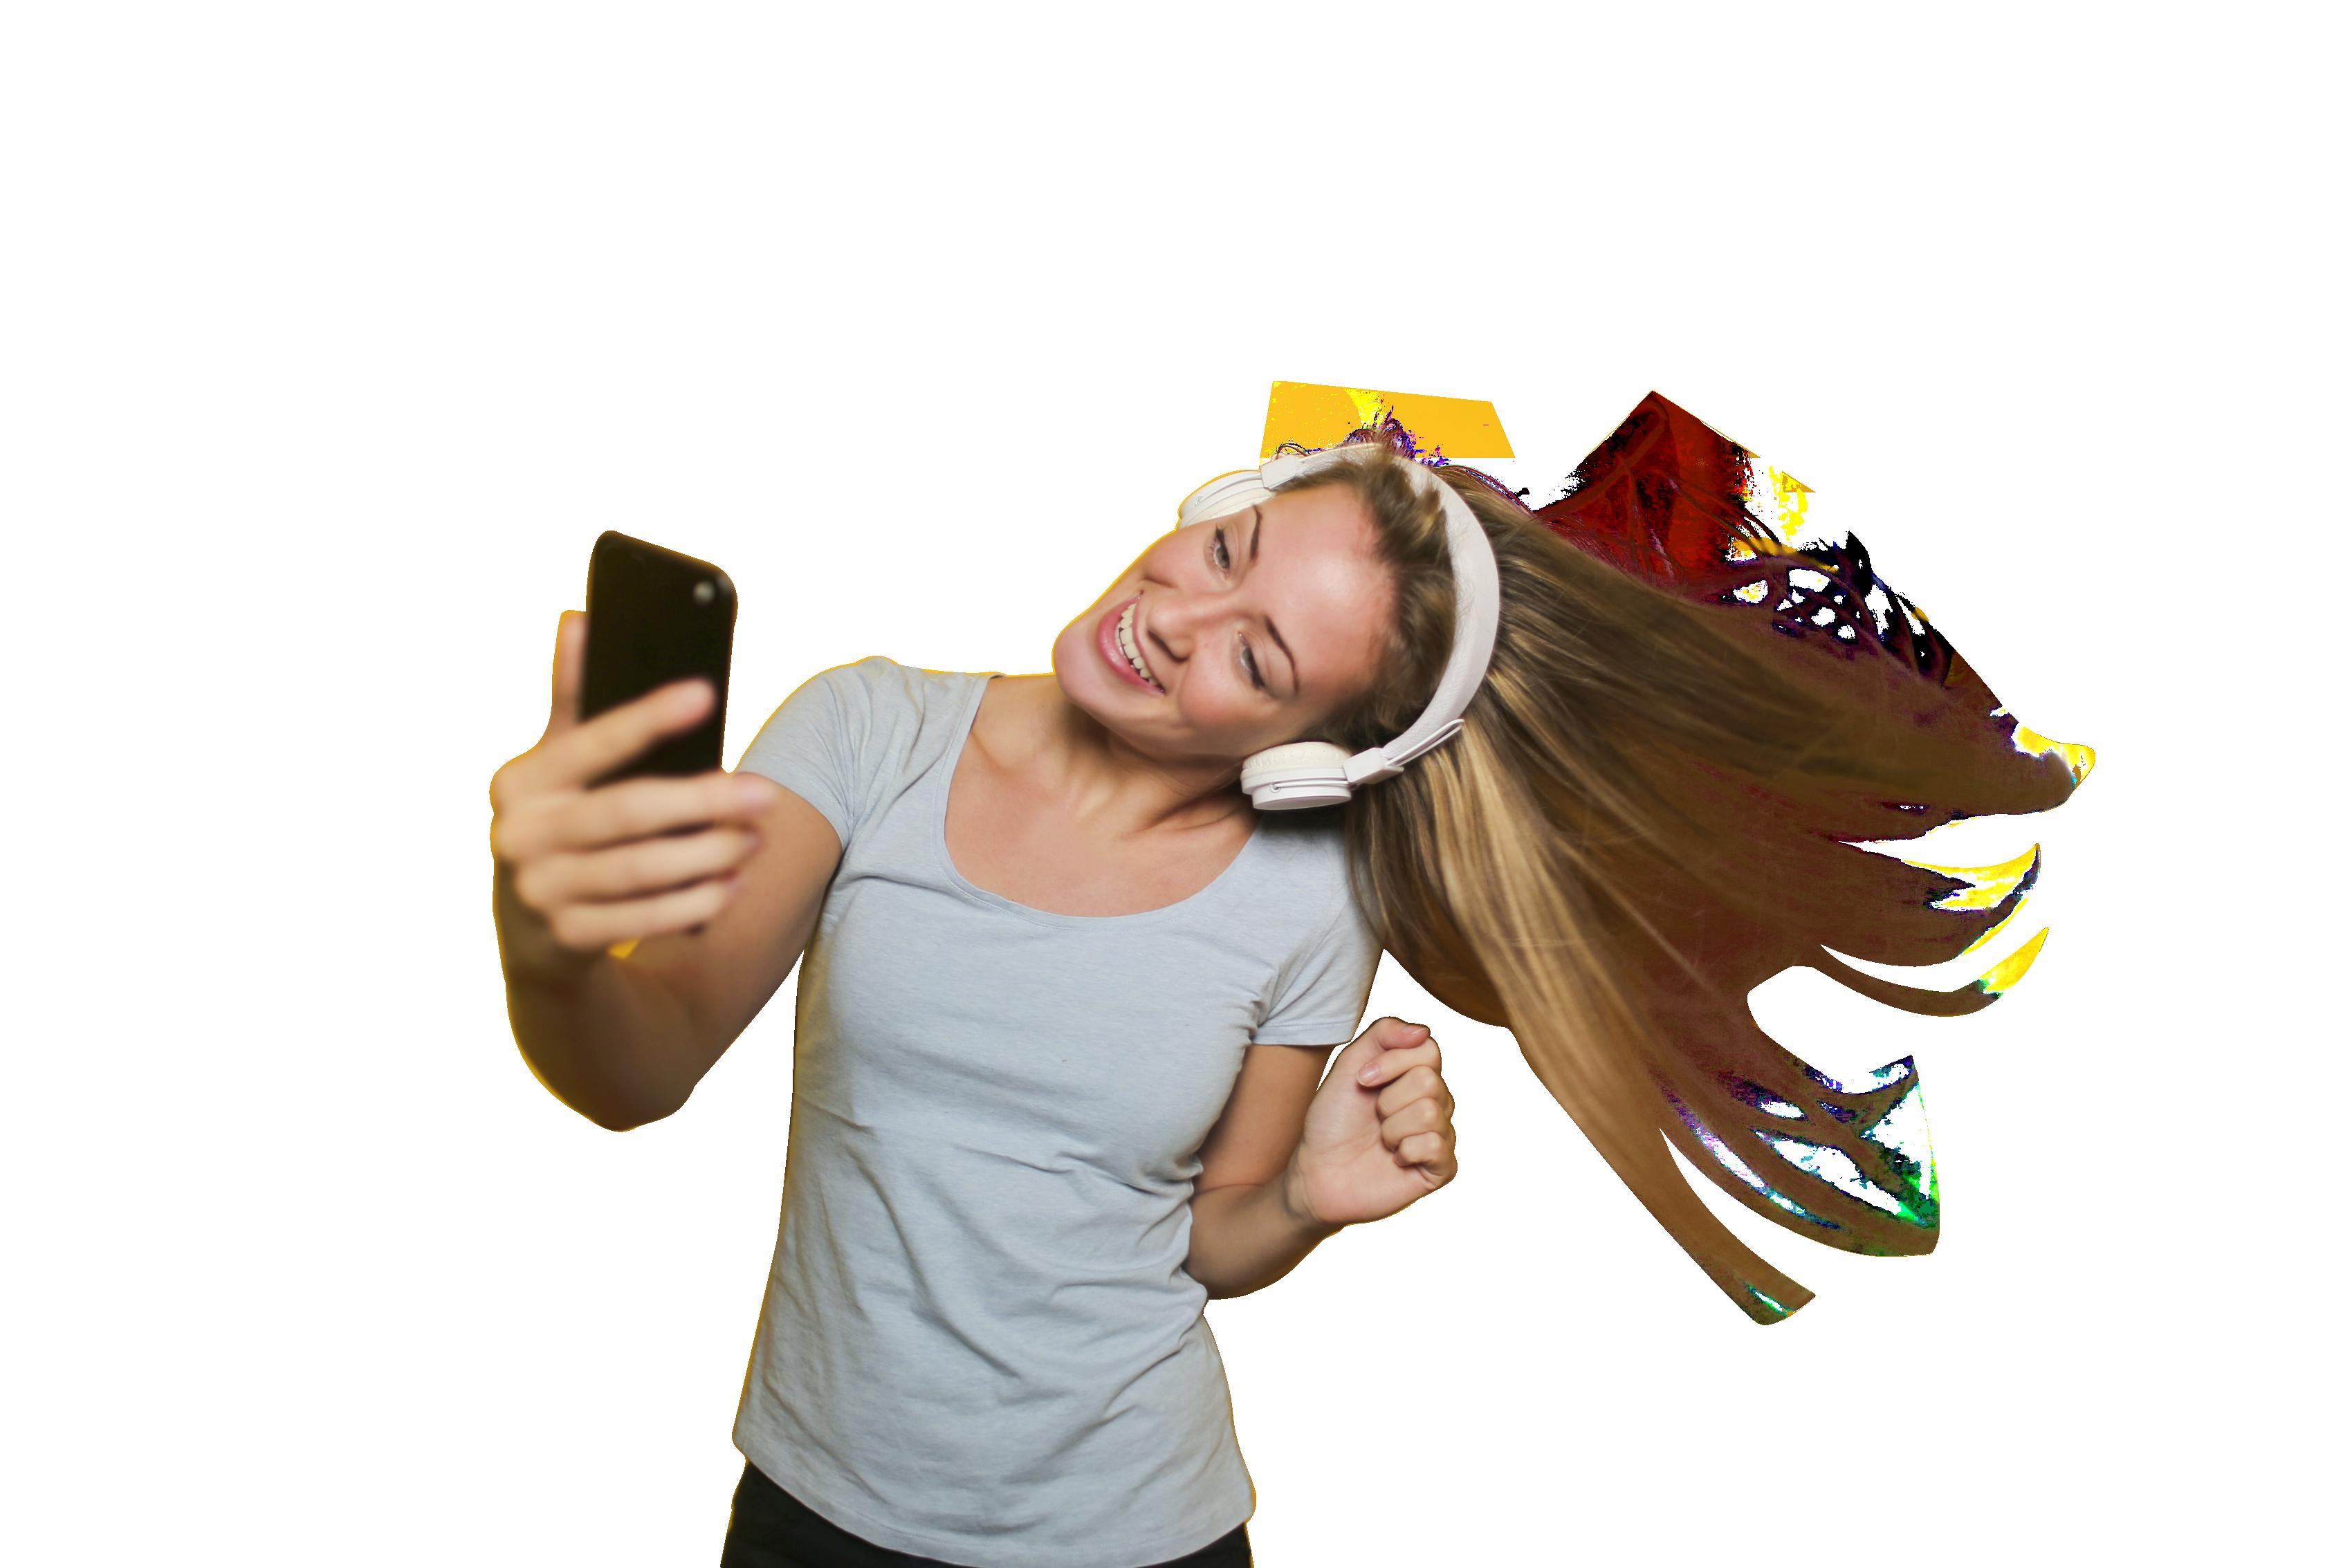 Girl Taking Selfie with listening music